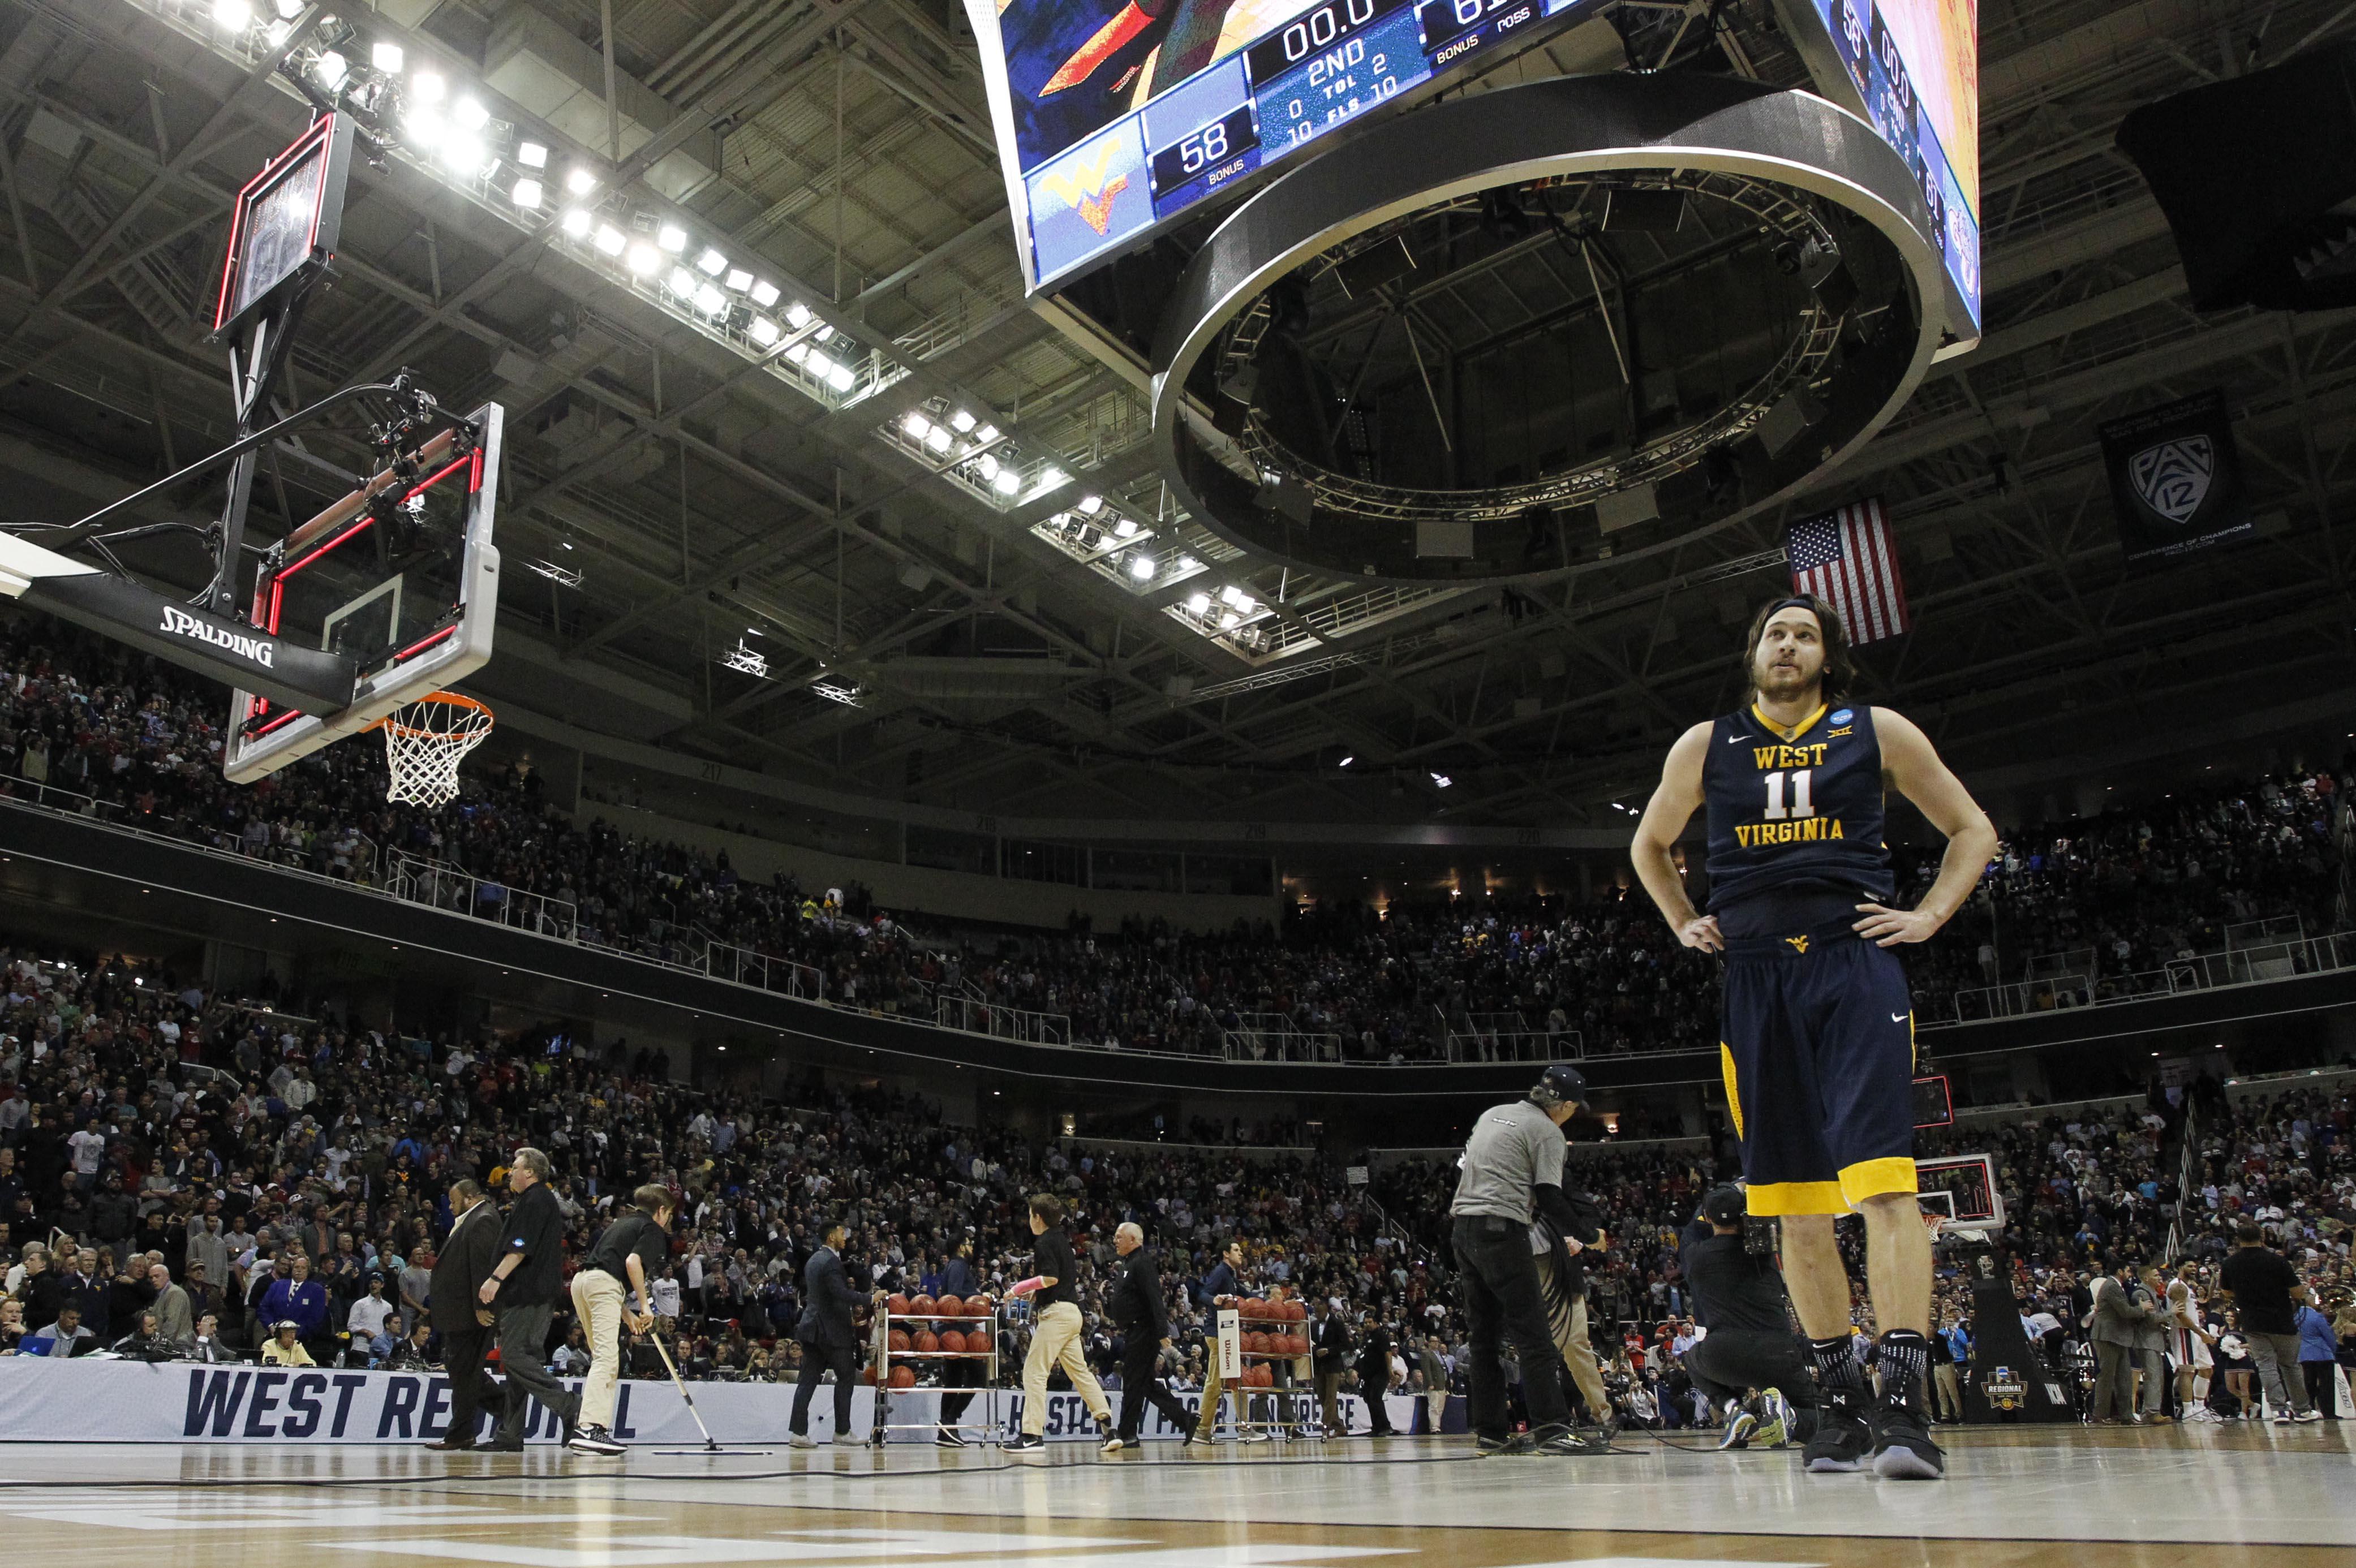 9966970-ncaa-basketball-ncaa-tournament-west-regional-gonzaga-vs-west-virginia